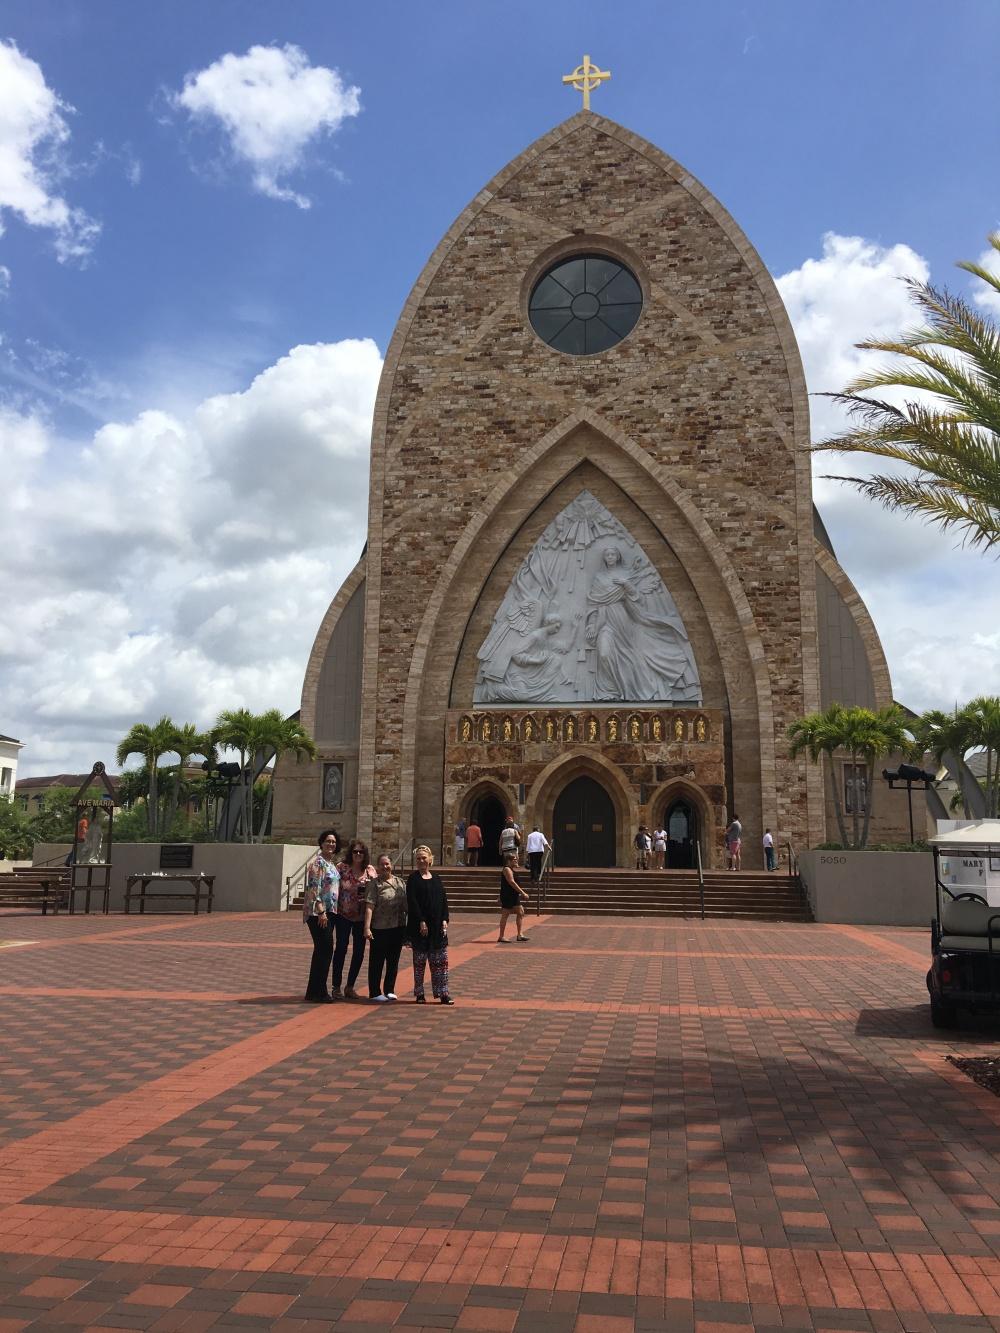 Columbiettes | KofC12240 | Ave Maria